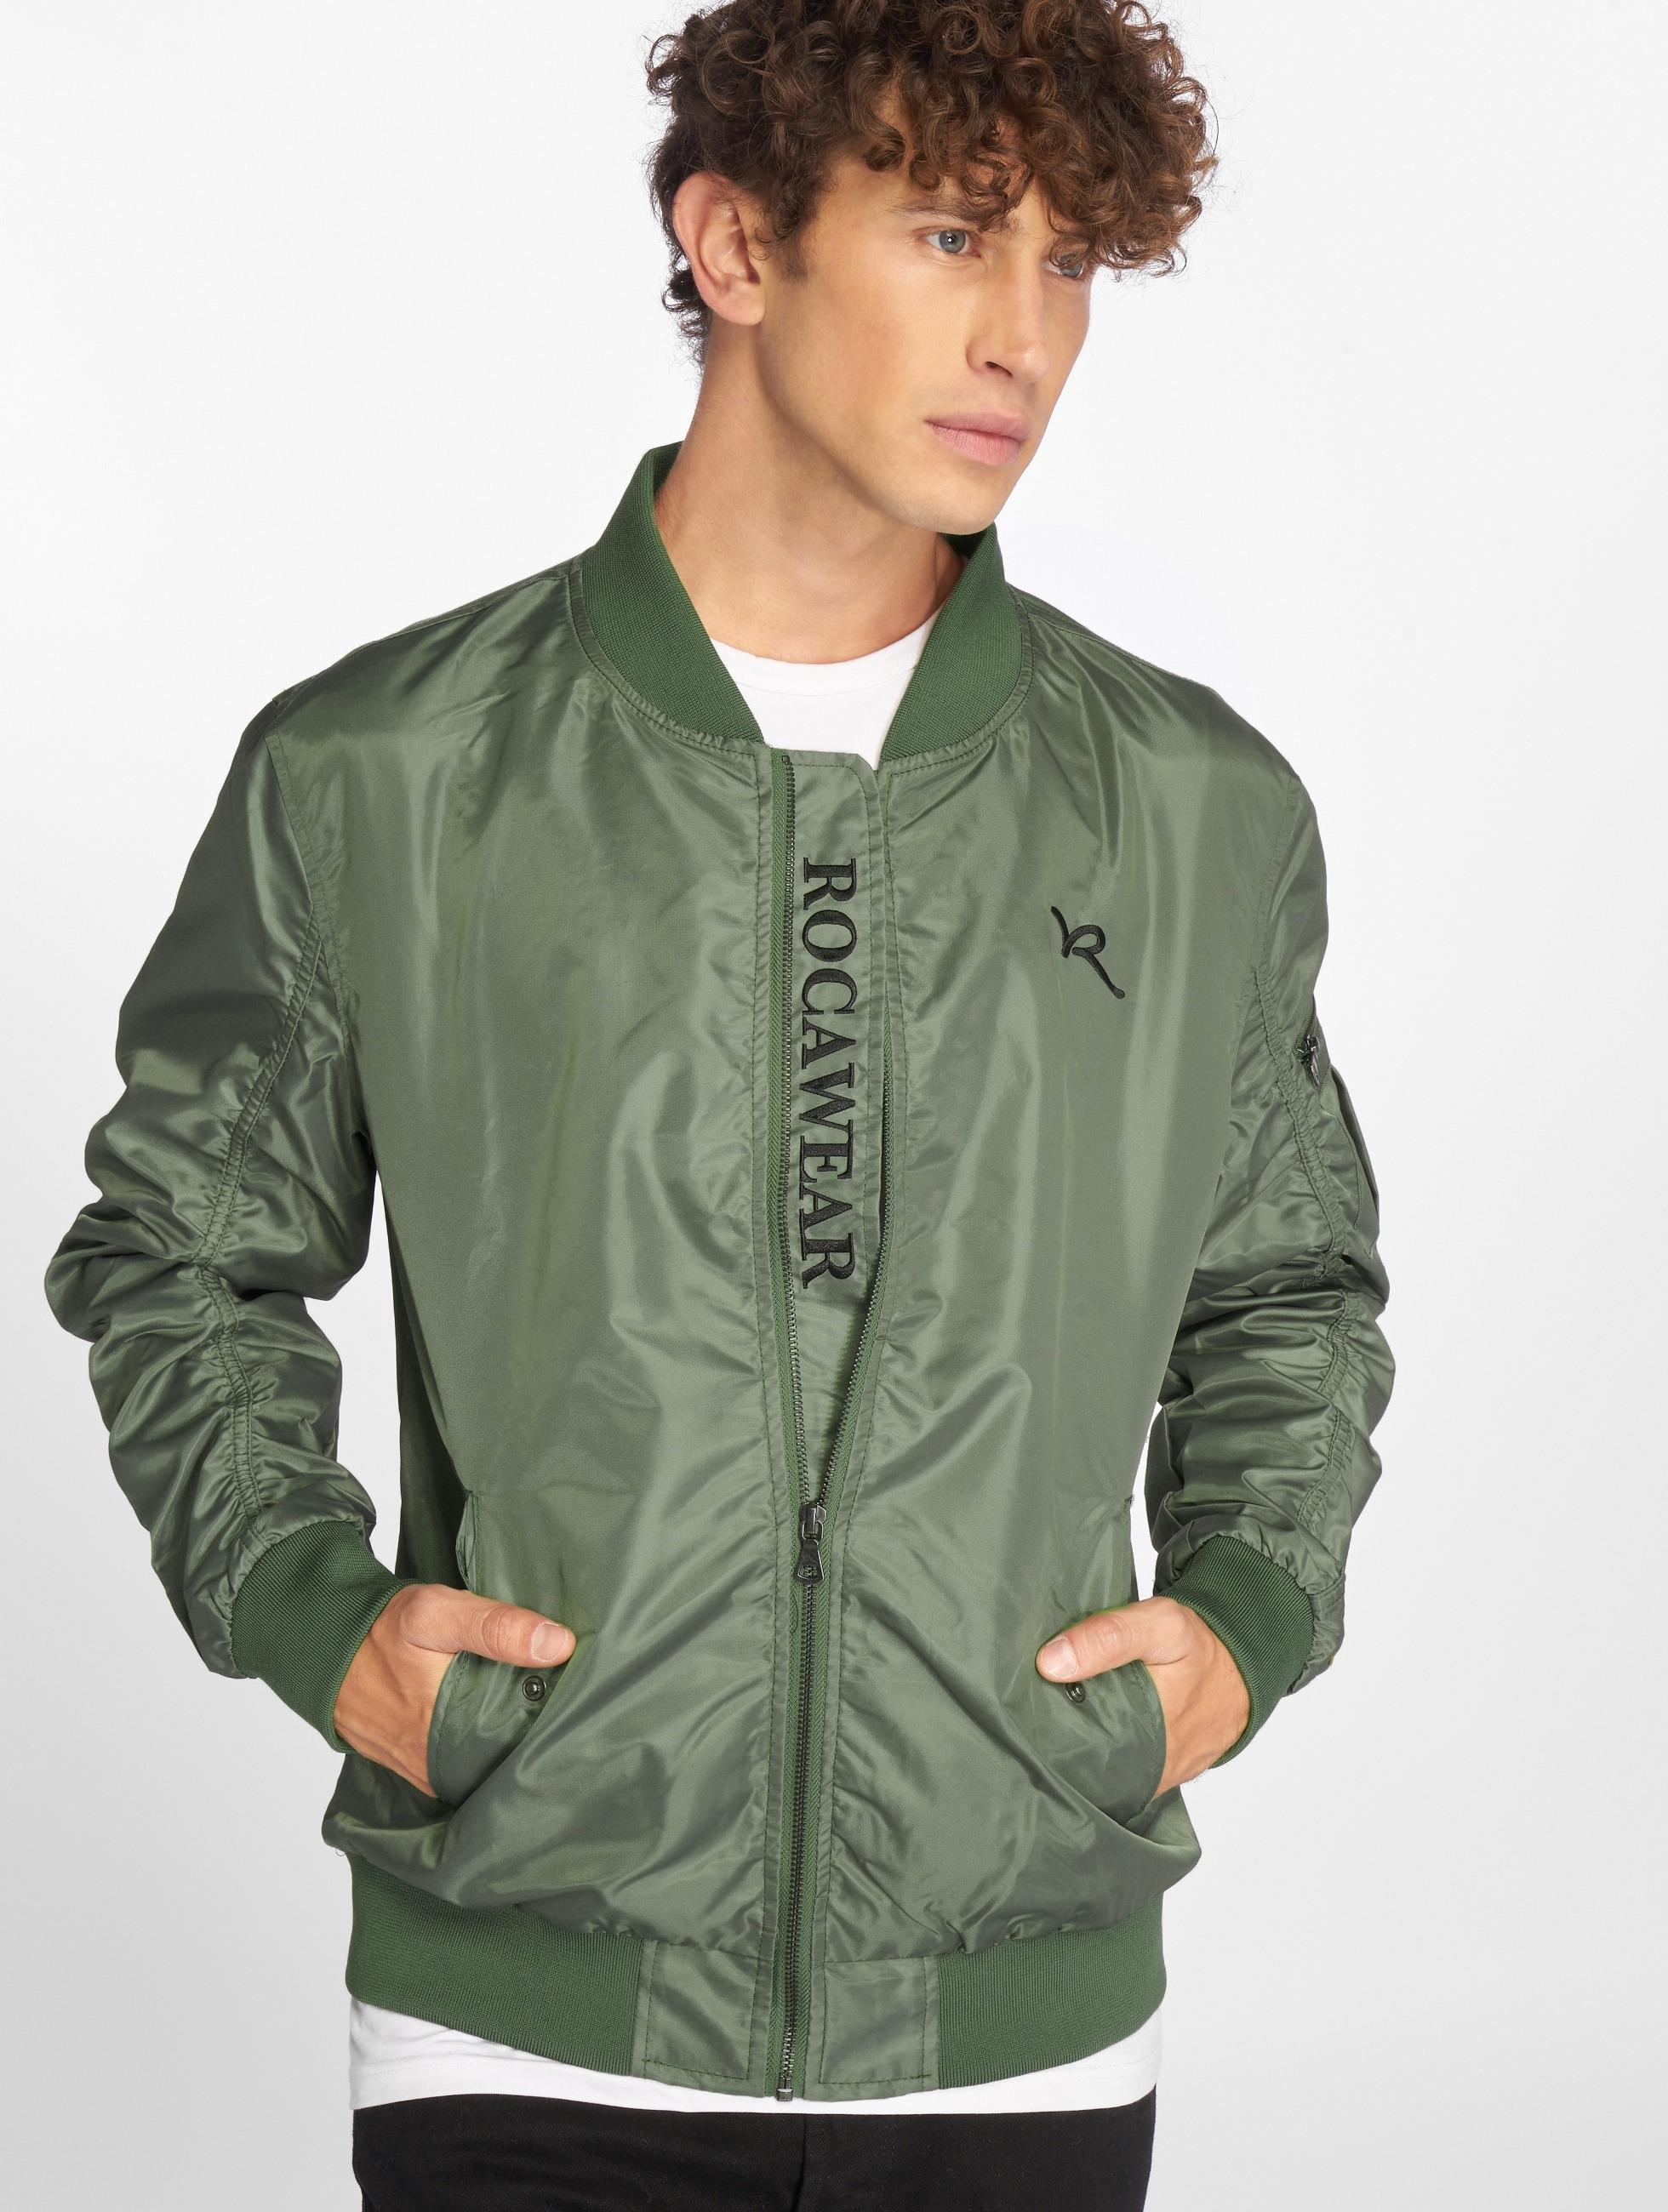 Rocawear / Bomber jacket Dariusz in olive XL